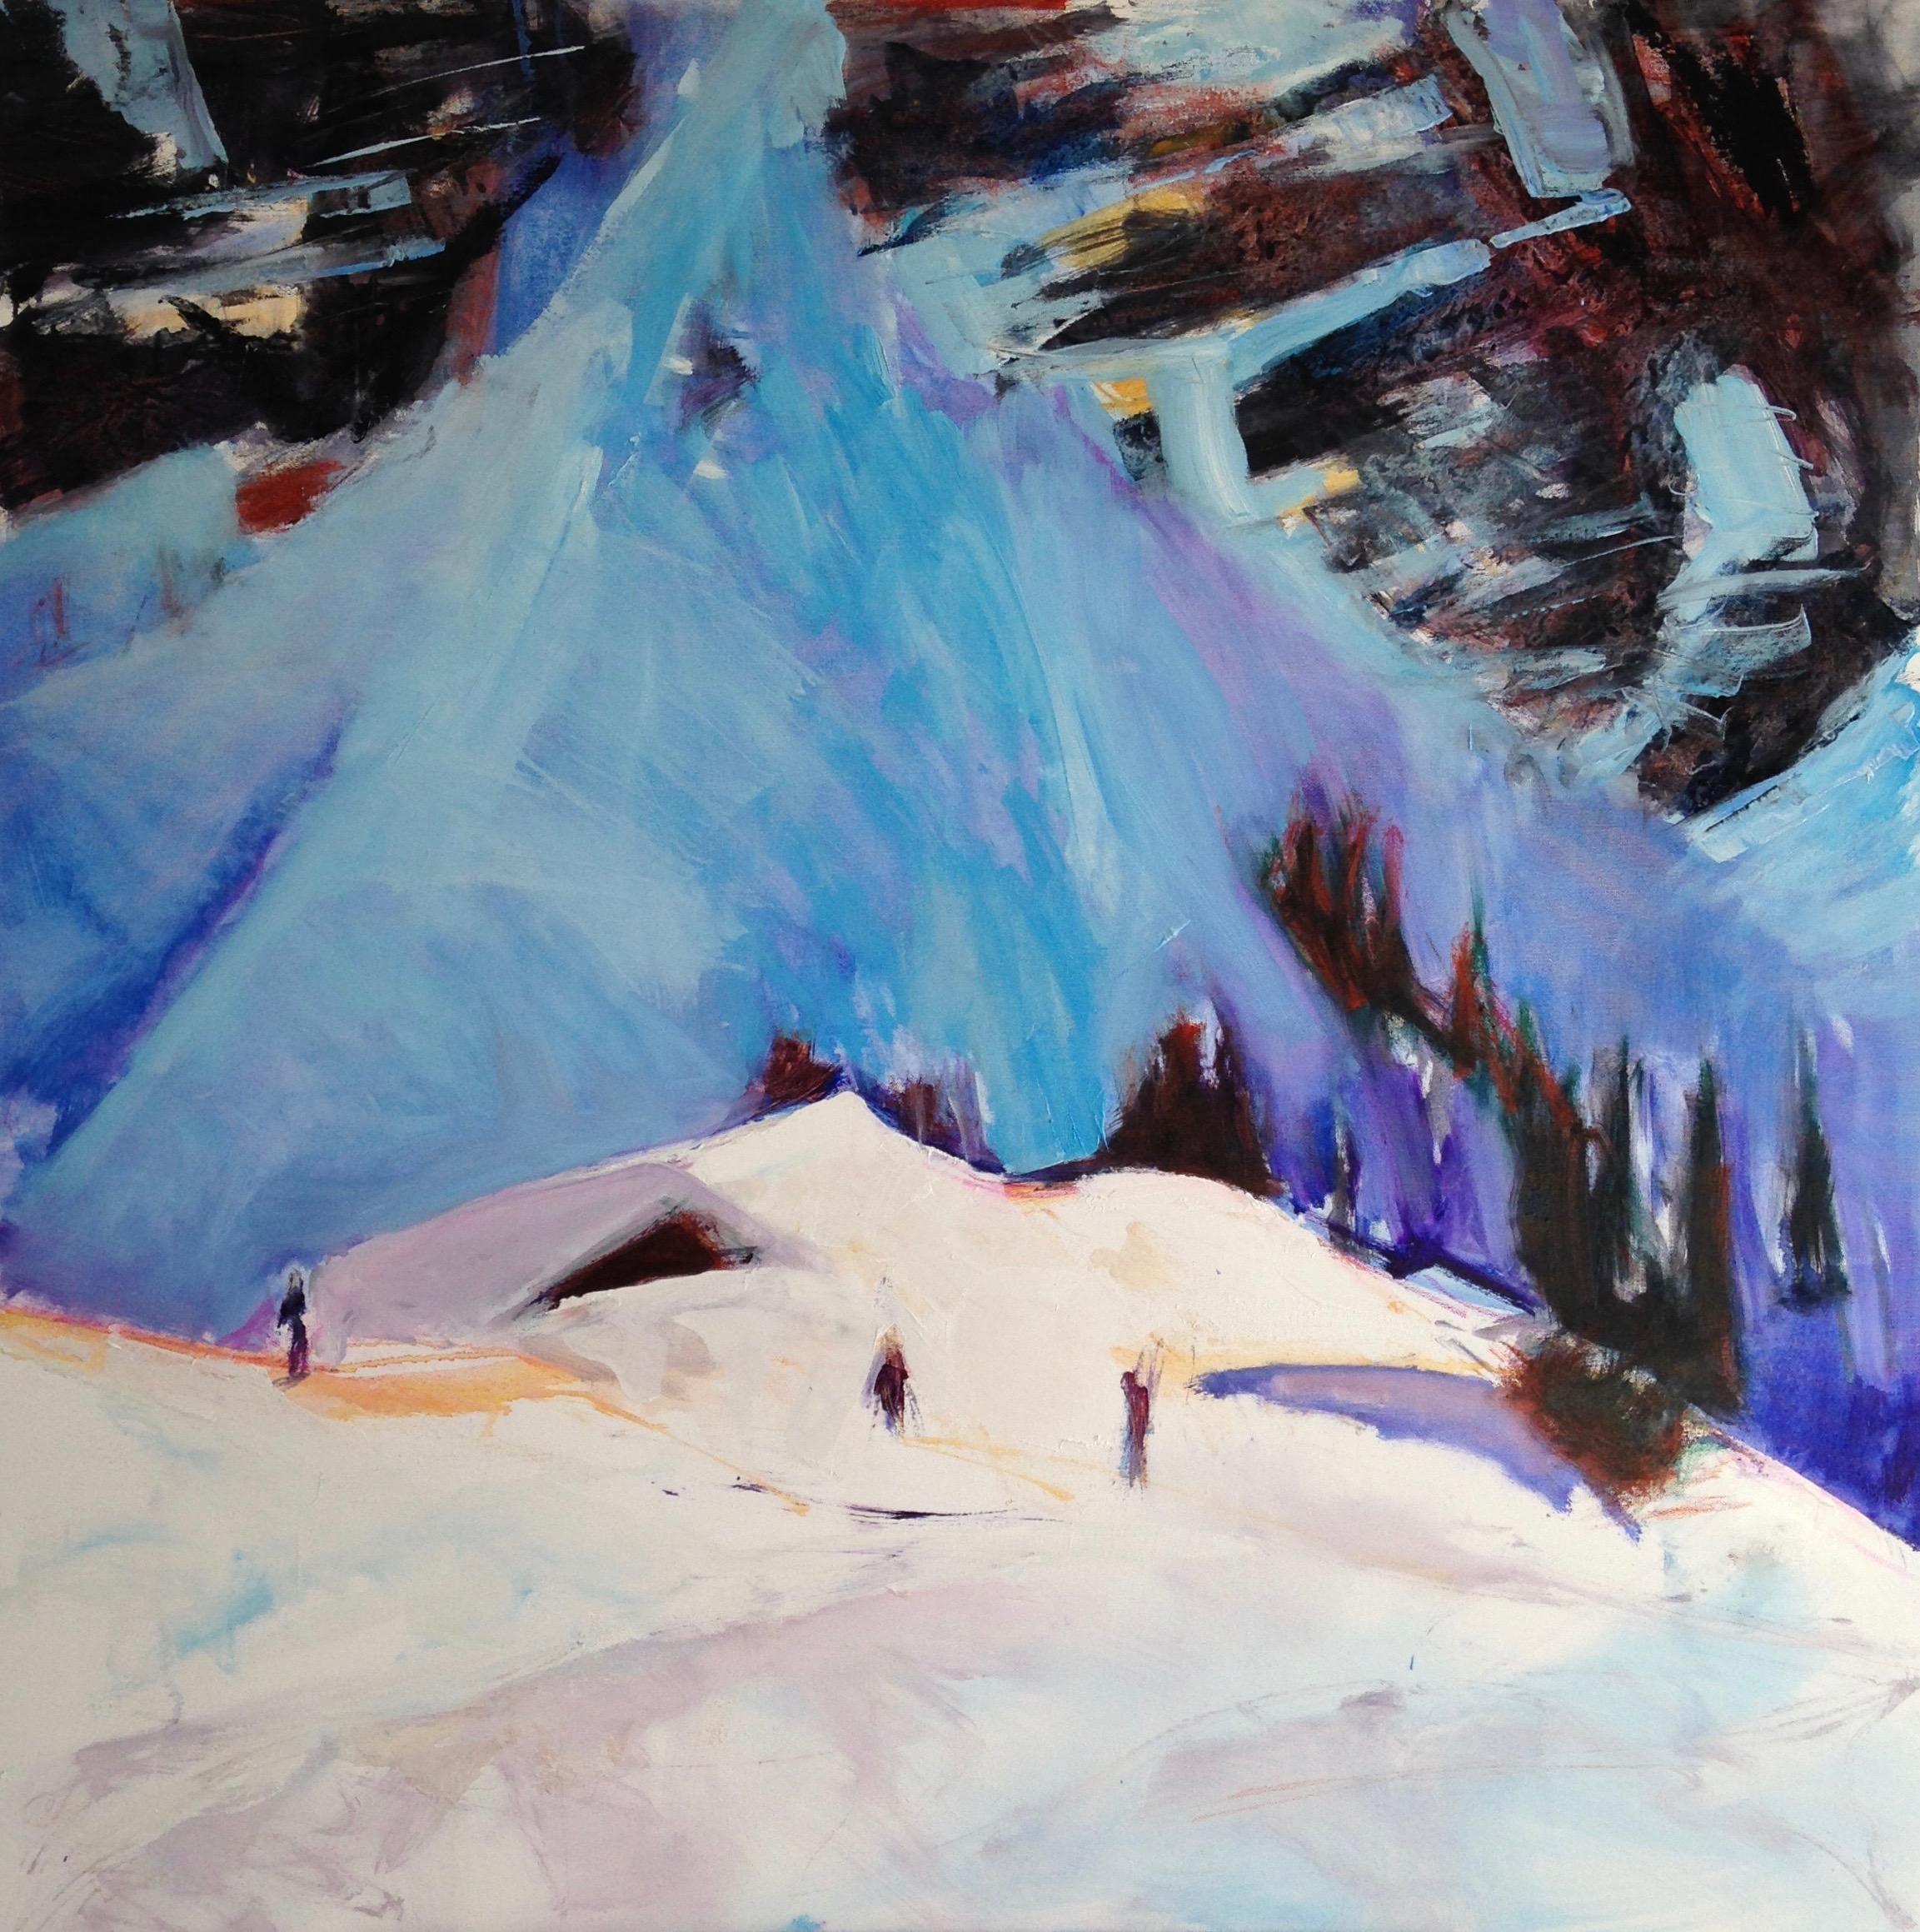 Après midi au Souay' Pippa Spiers 100 x 100 cm, oil on canvas